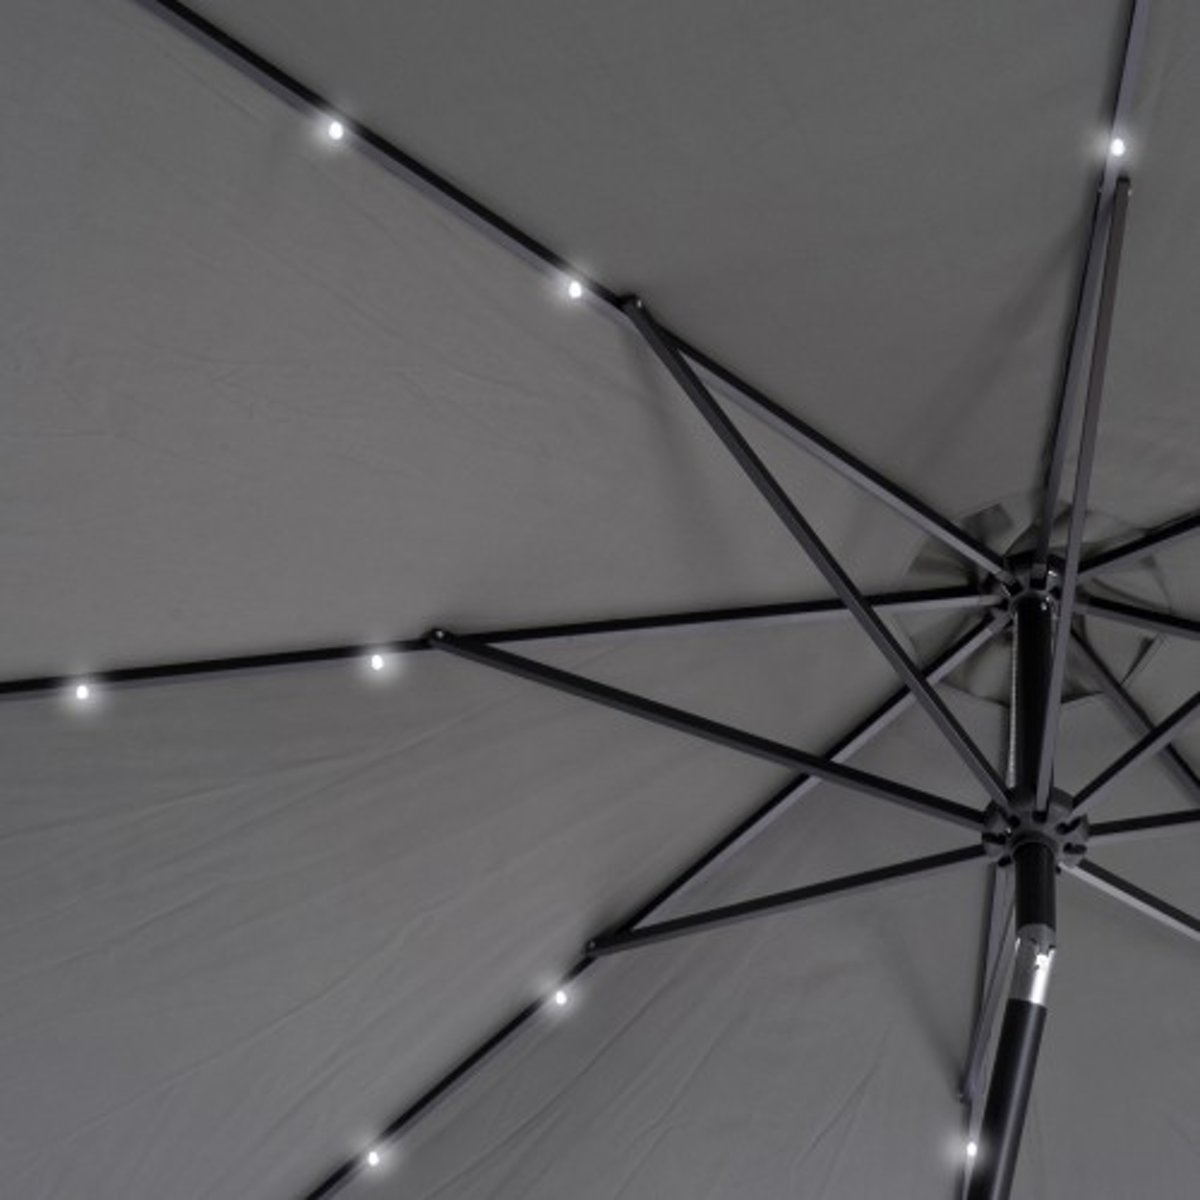 bol.com | SenS-Line parasol met LED verlichting-Antr. grijs